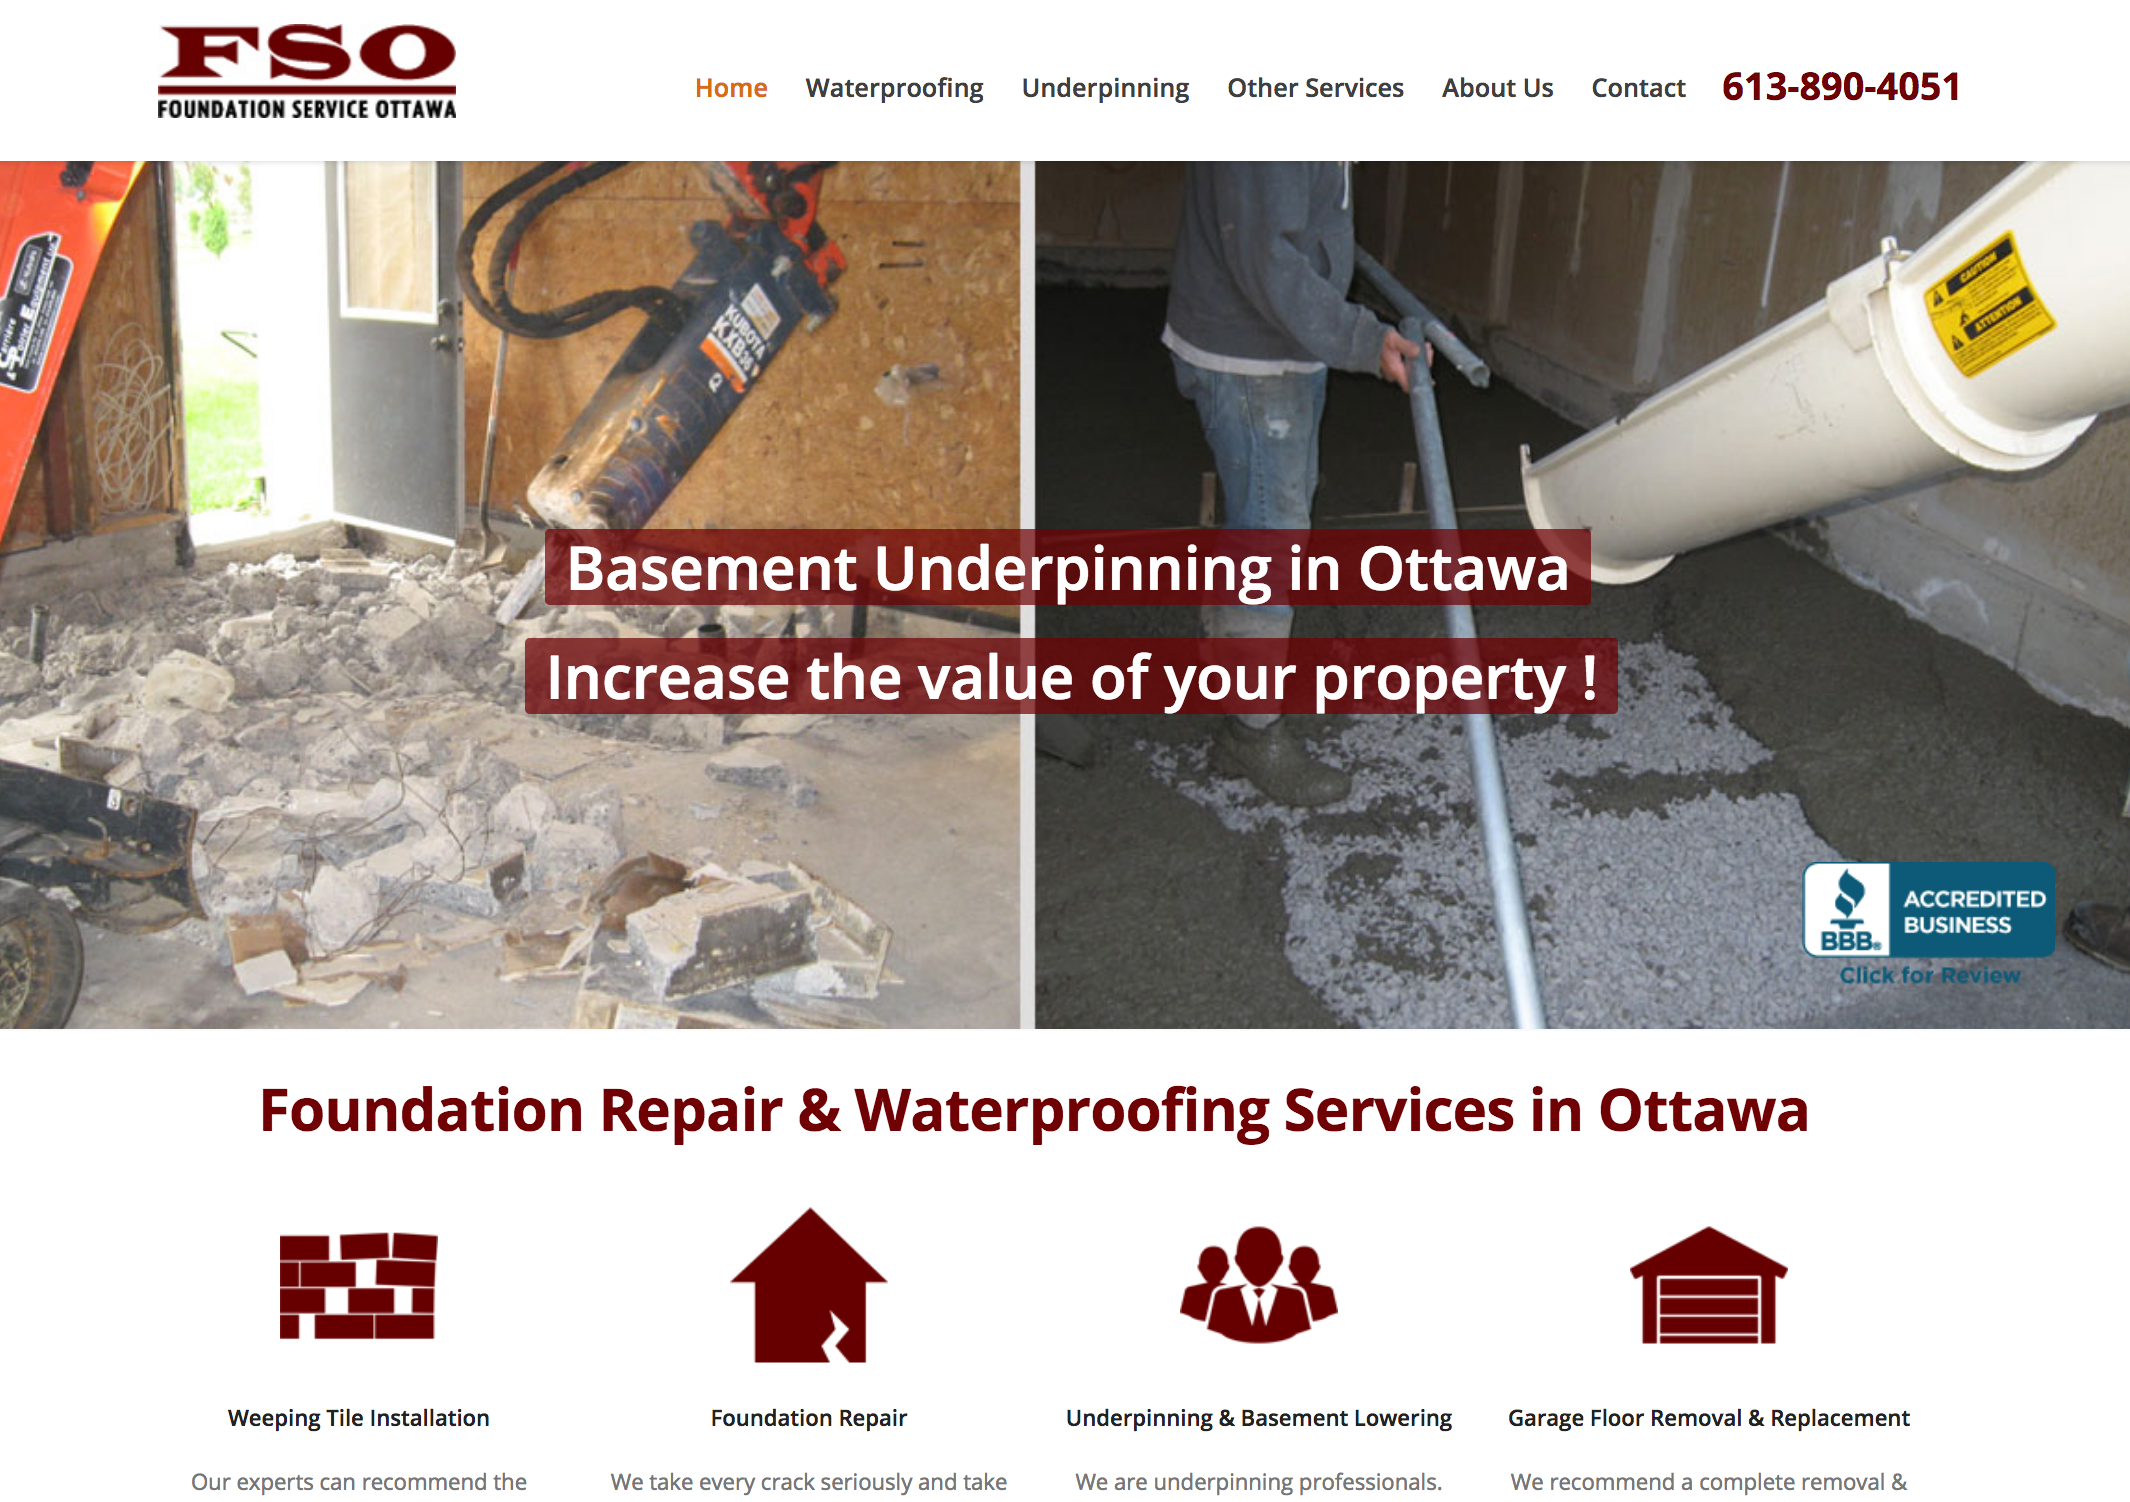 Ottawa Foundation Service